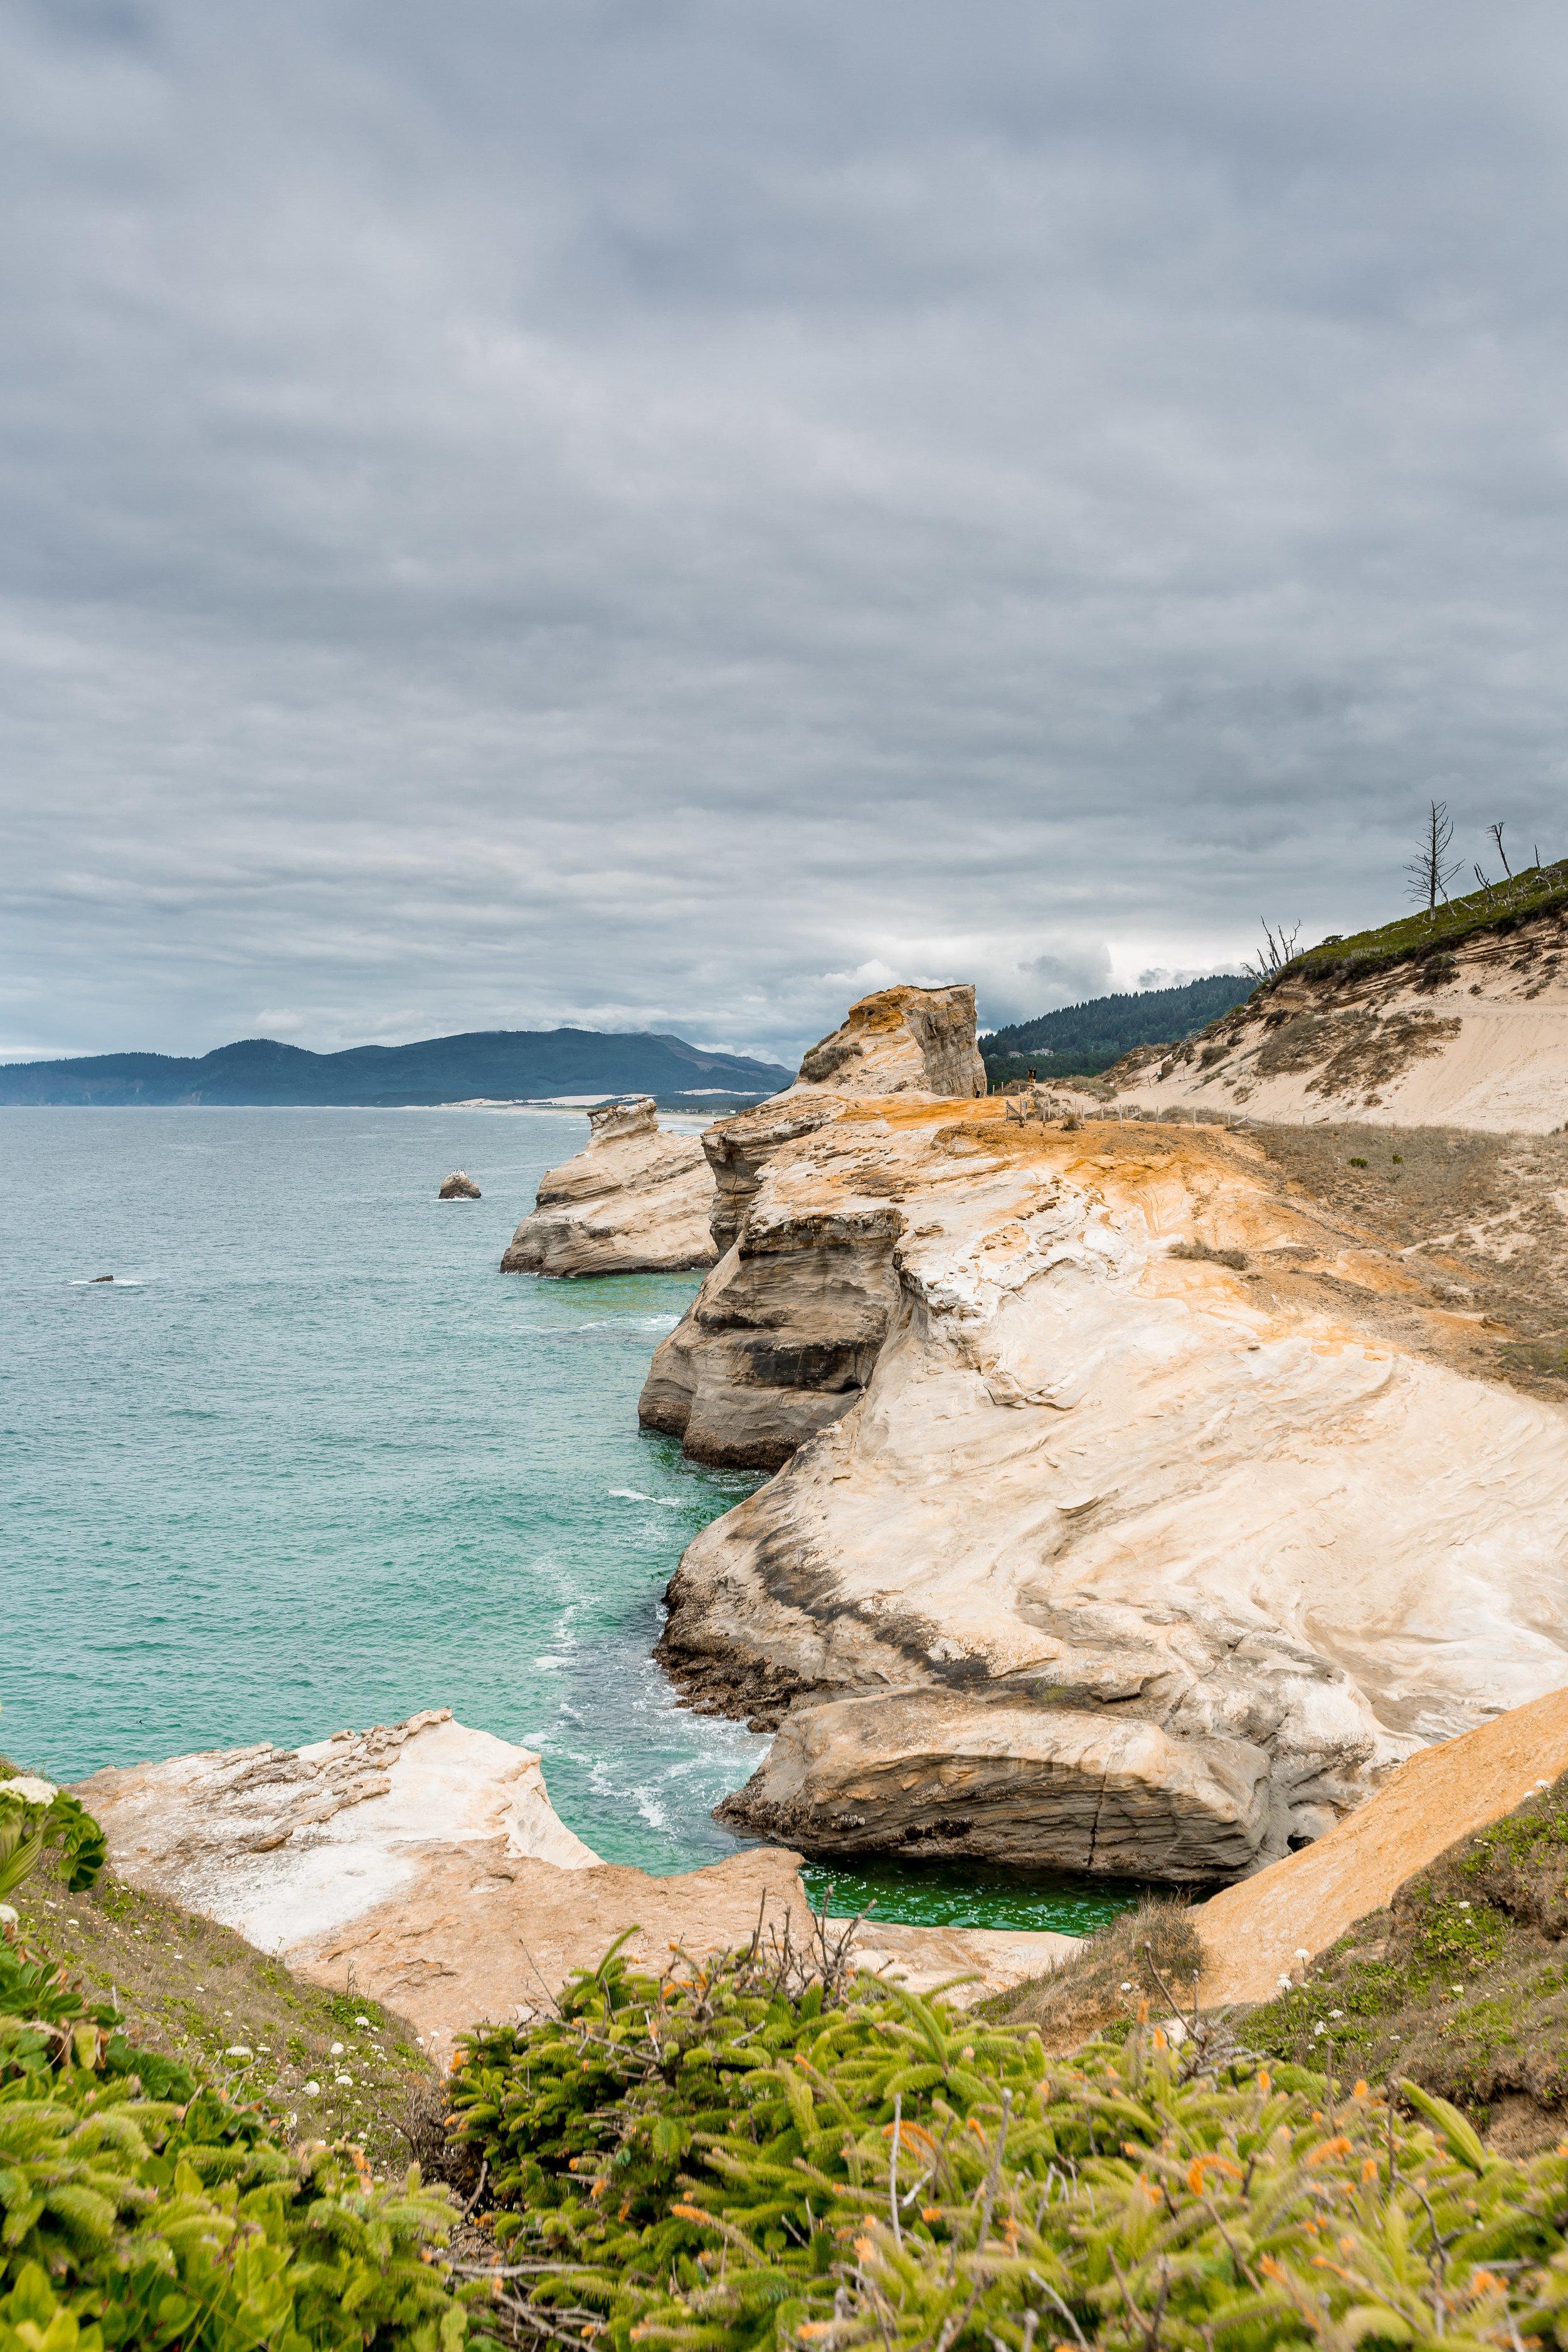 nicole-daacke-photography-oregon-coast-landscapes-elopement-photographer-wedding-photography-adventure-lifestyle-roadtrip-along-oregon-coast-cape-kiwanda-oceanside-beach-cannon-beach-oregon-pnw-5.jpg